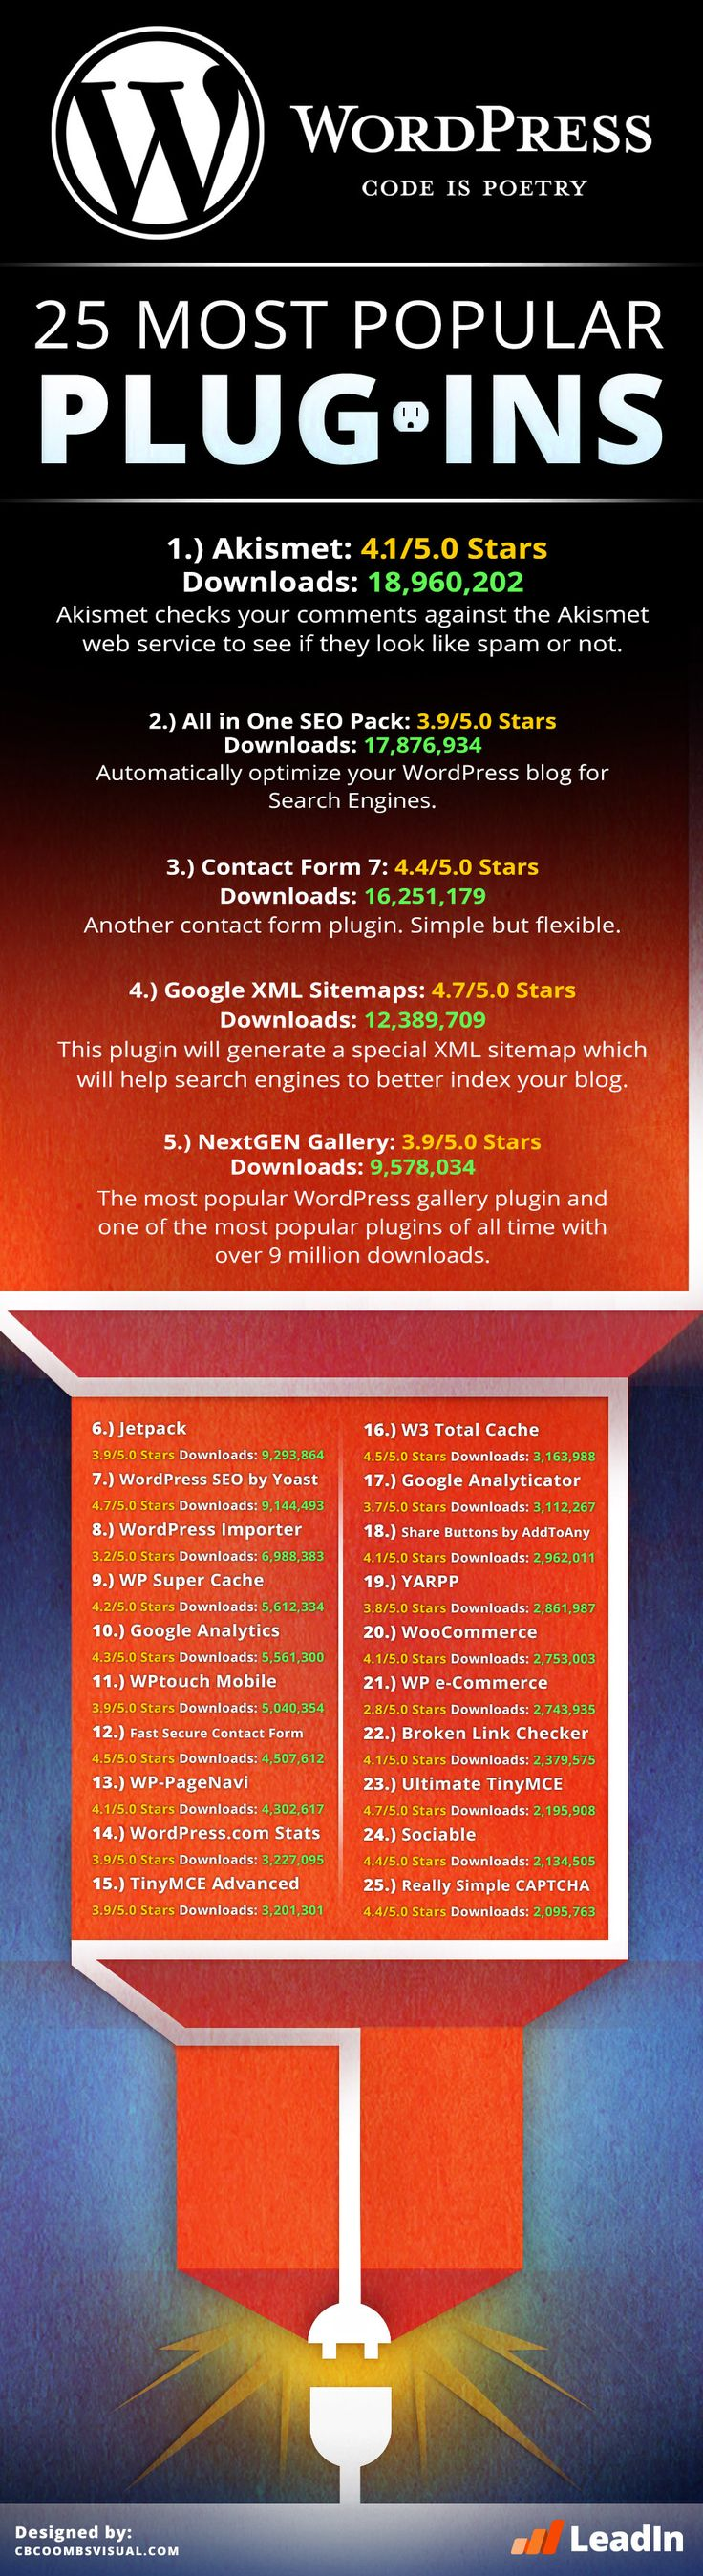 The Top 25 WordPress Plugins - Jeffbullas's Blog | #TheMarketingTechAlert